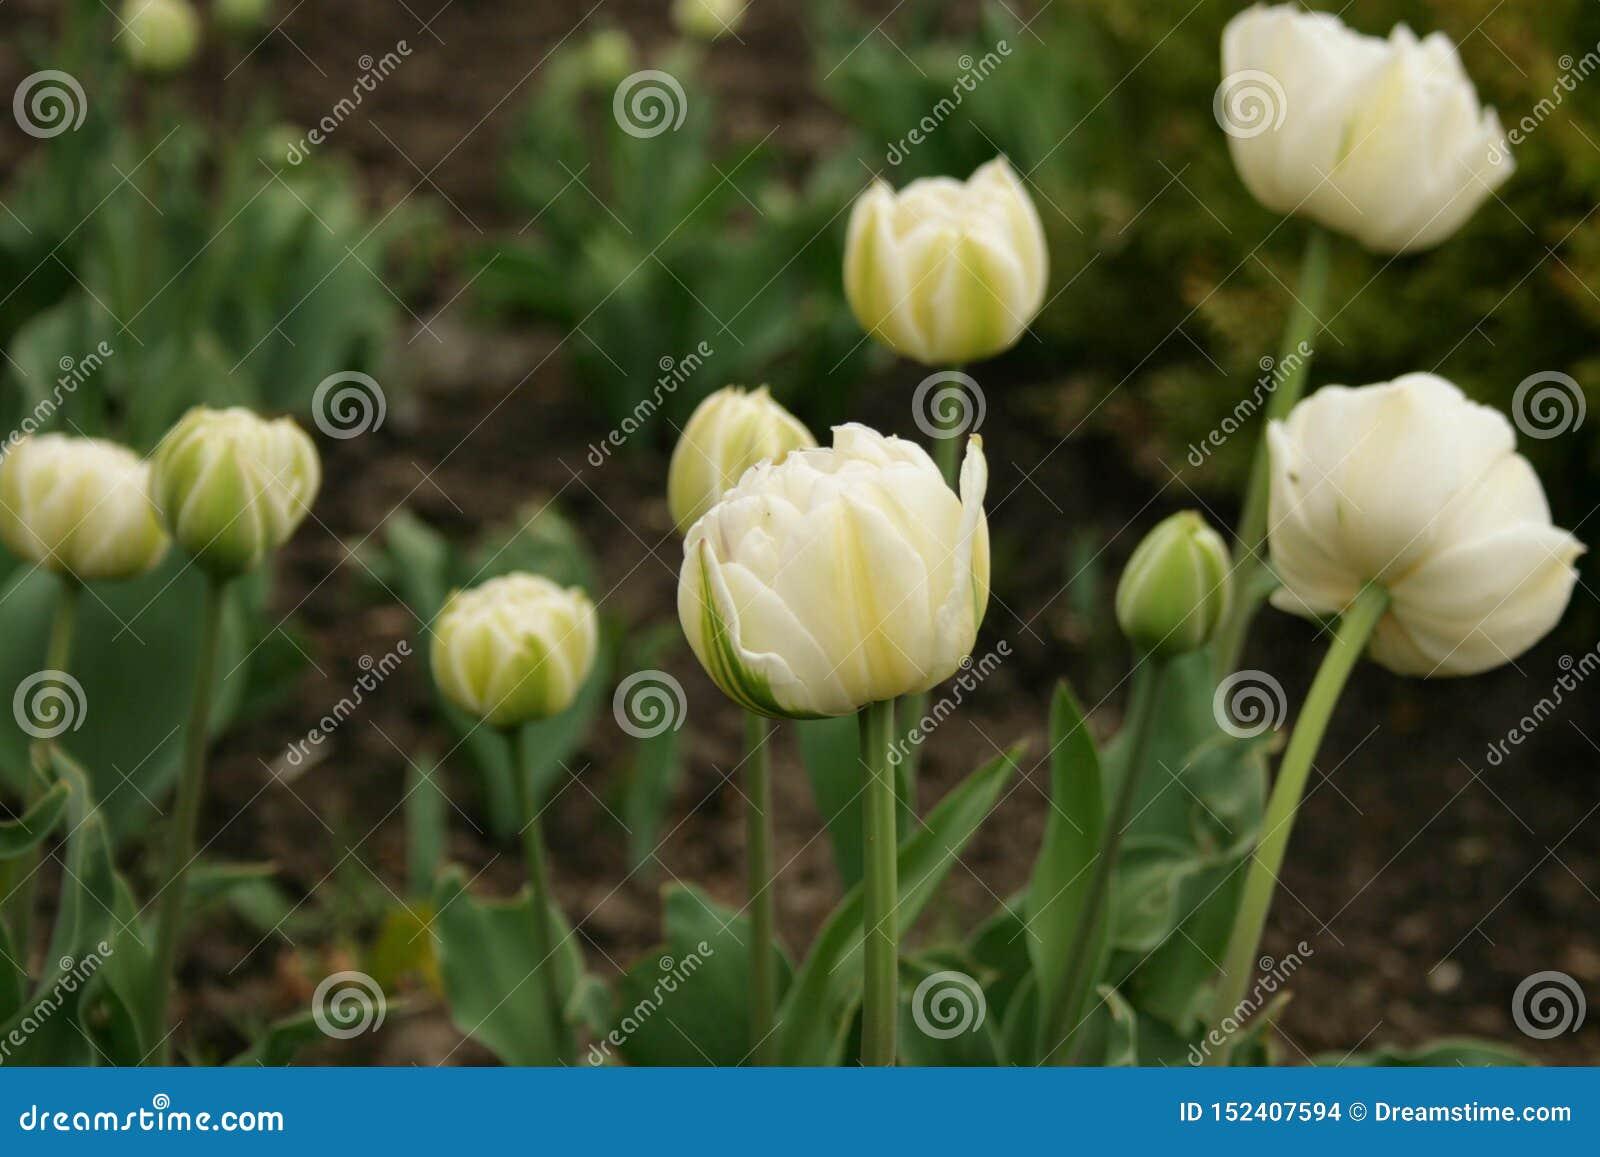 Spring flowers - white tulips